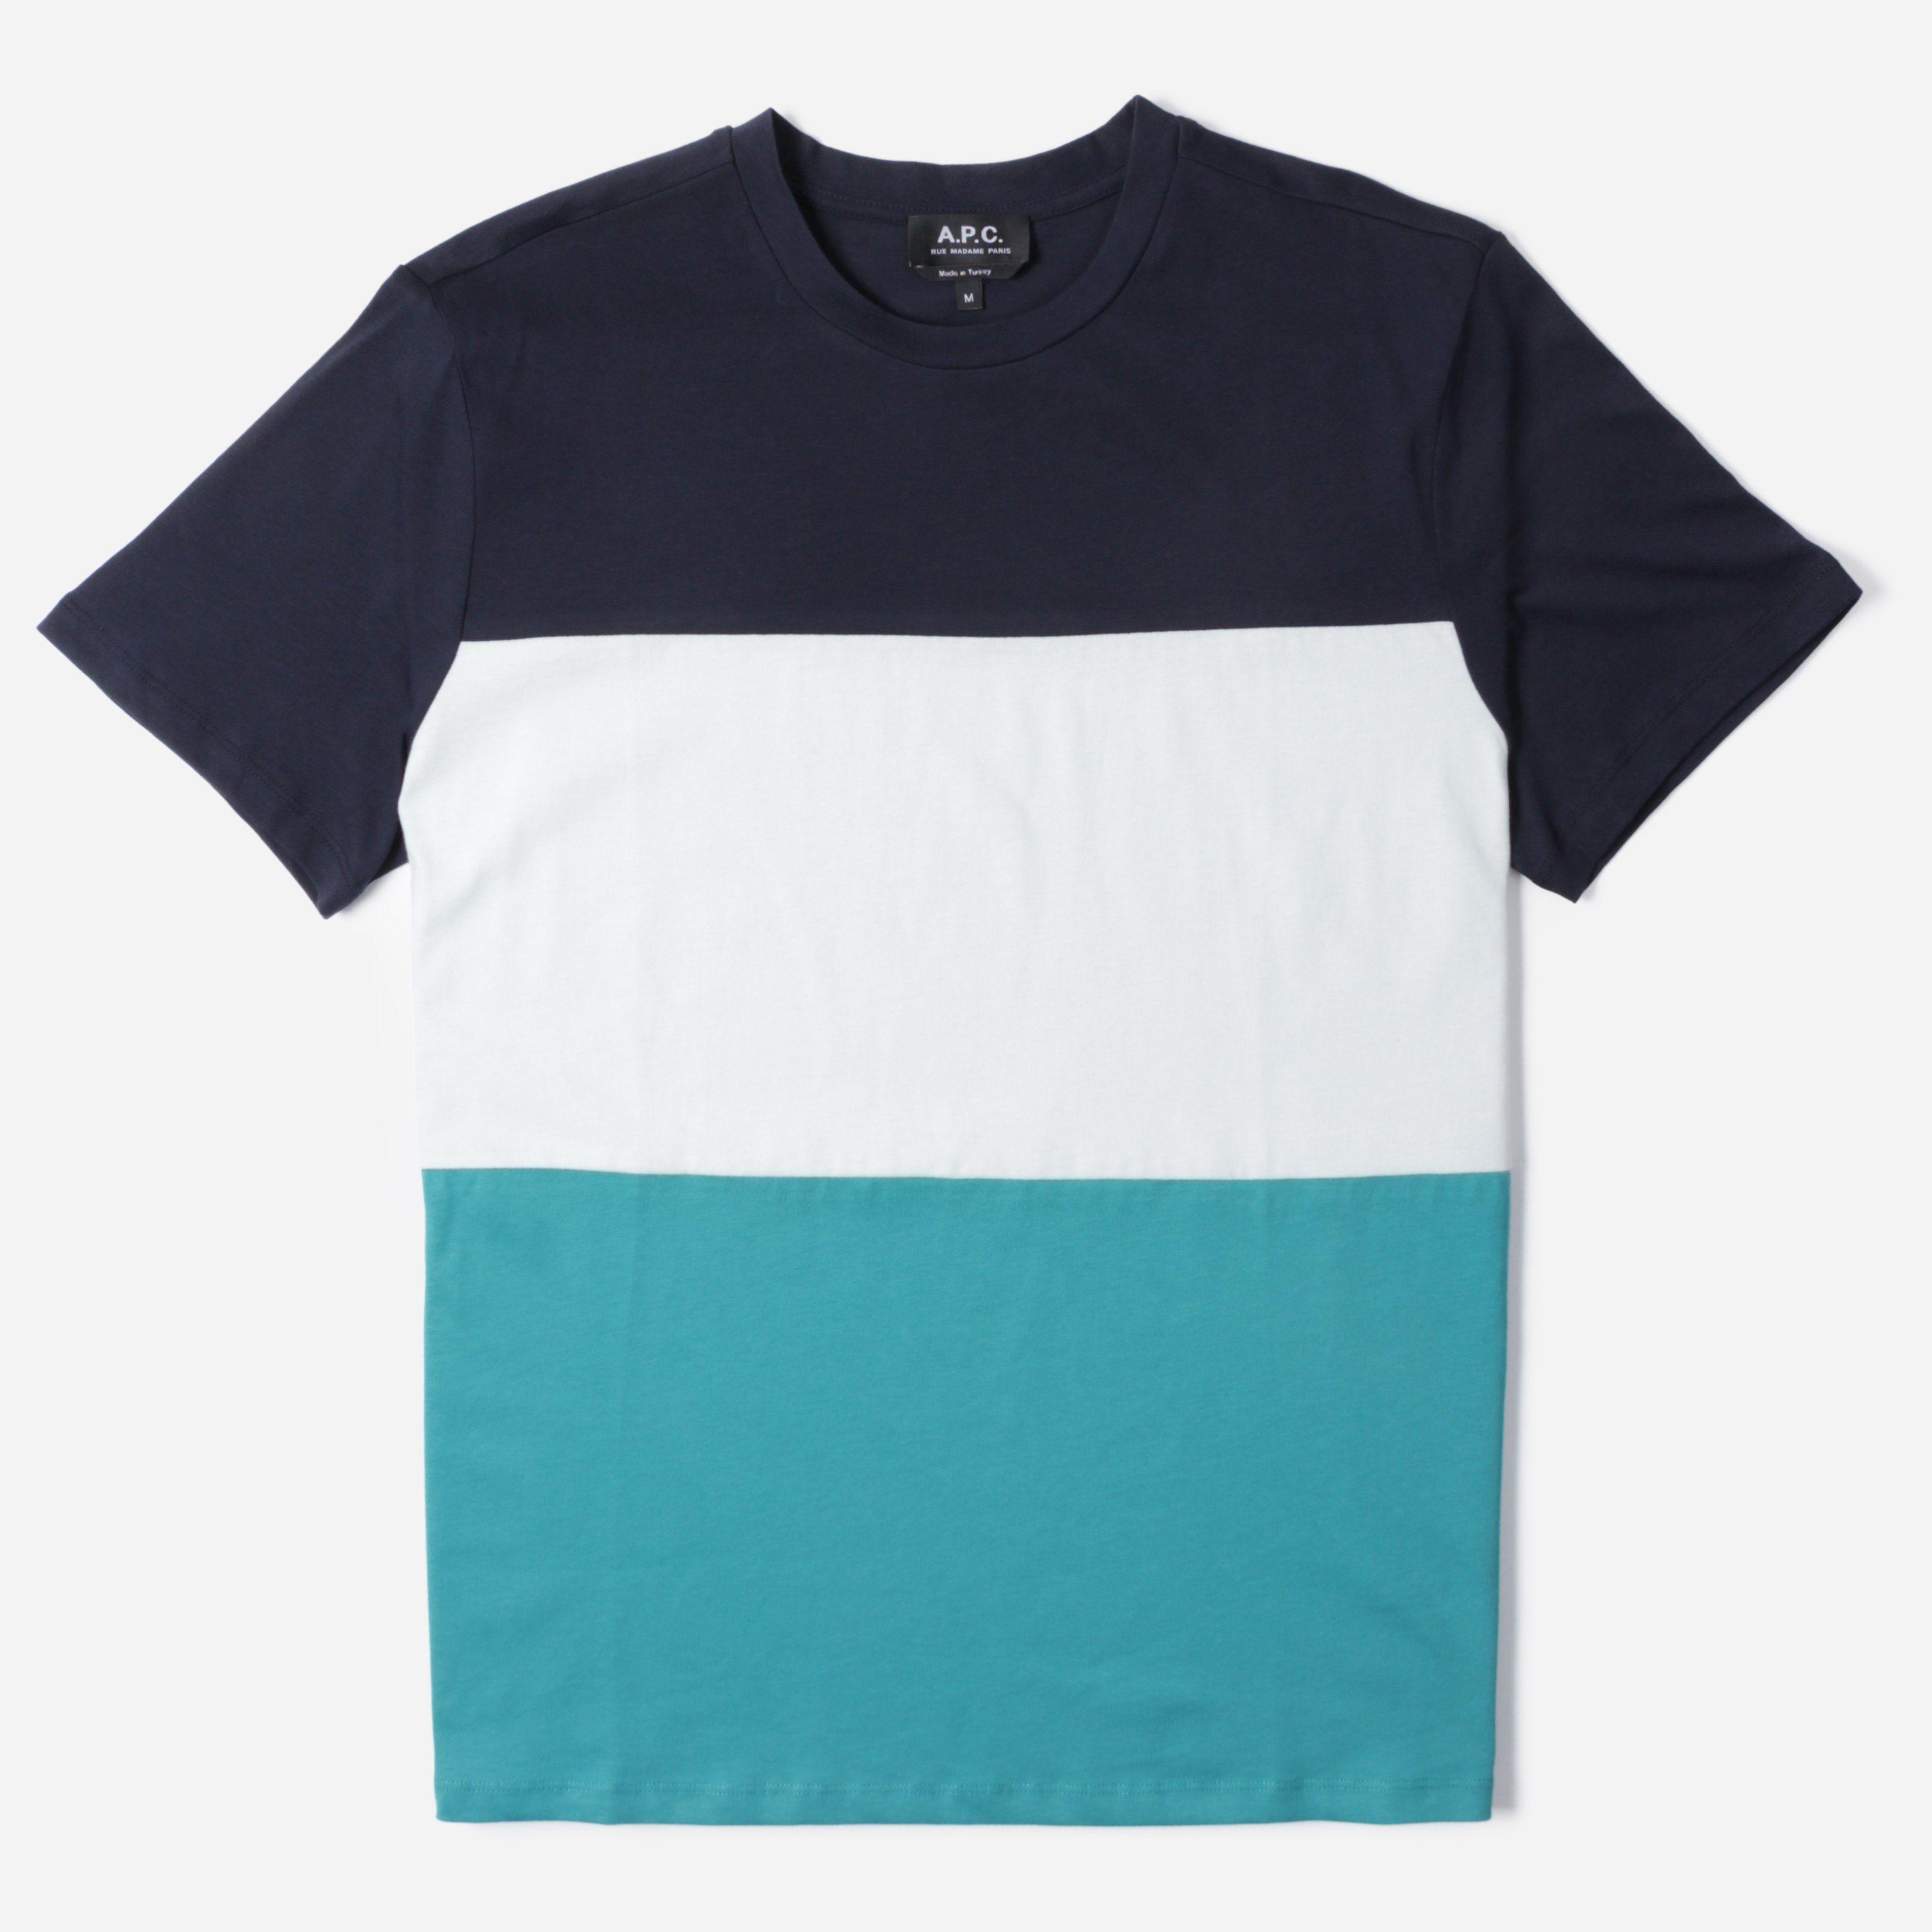 A.P.C. Pedro Stripe T-Shirt